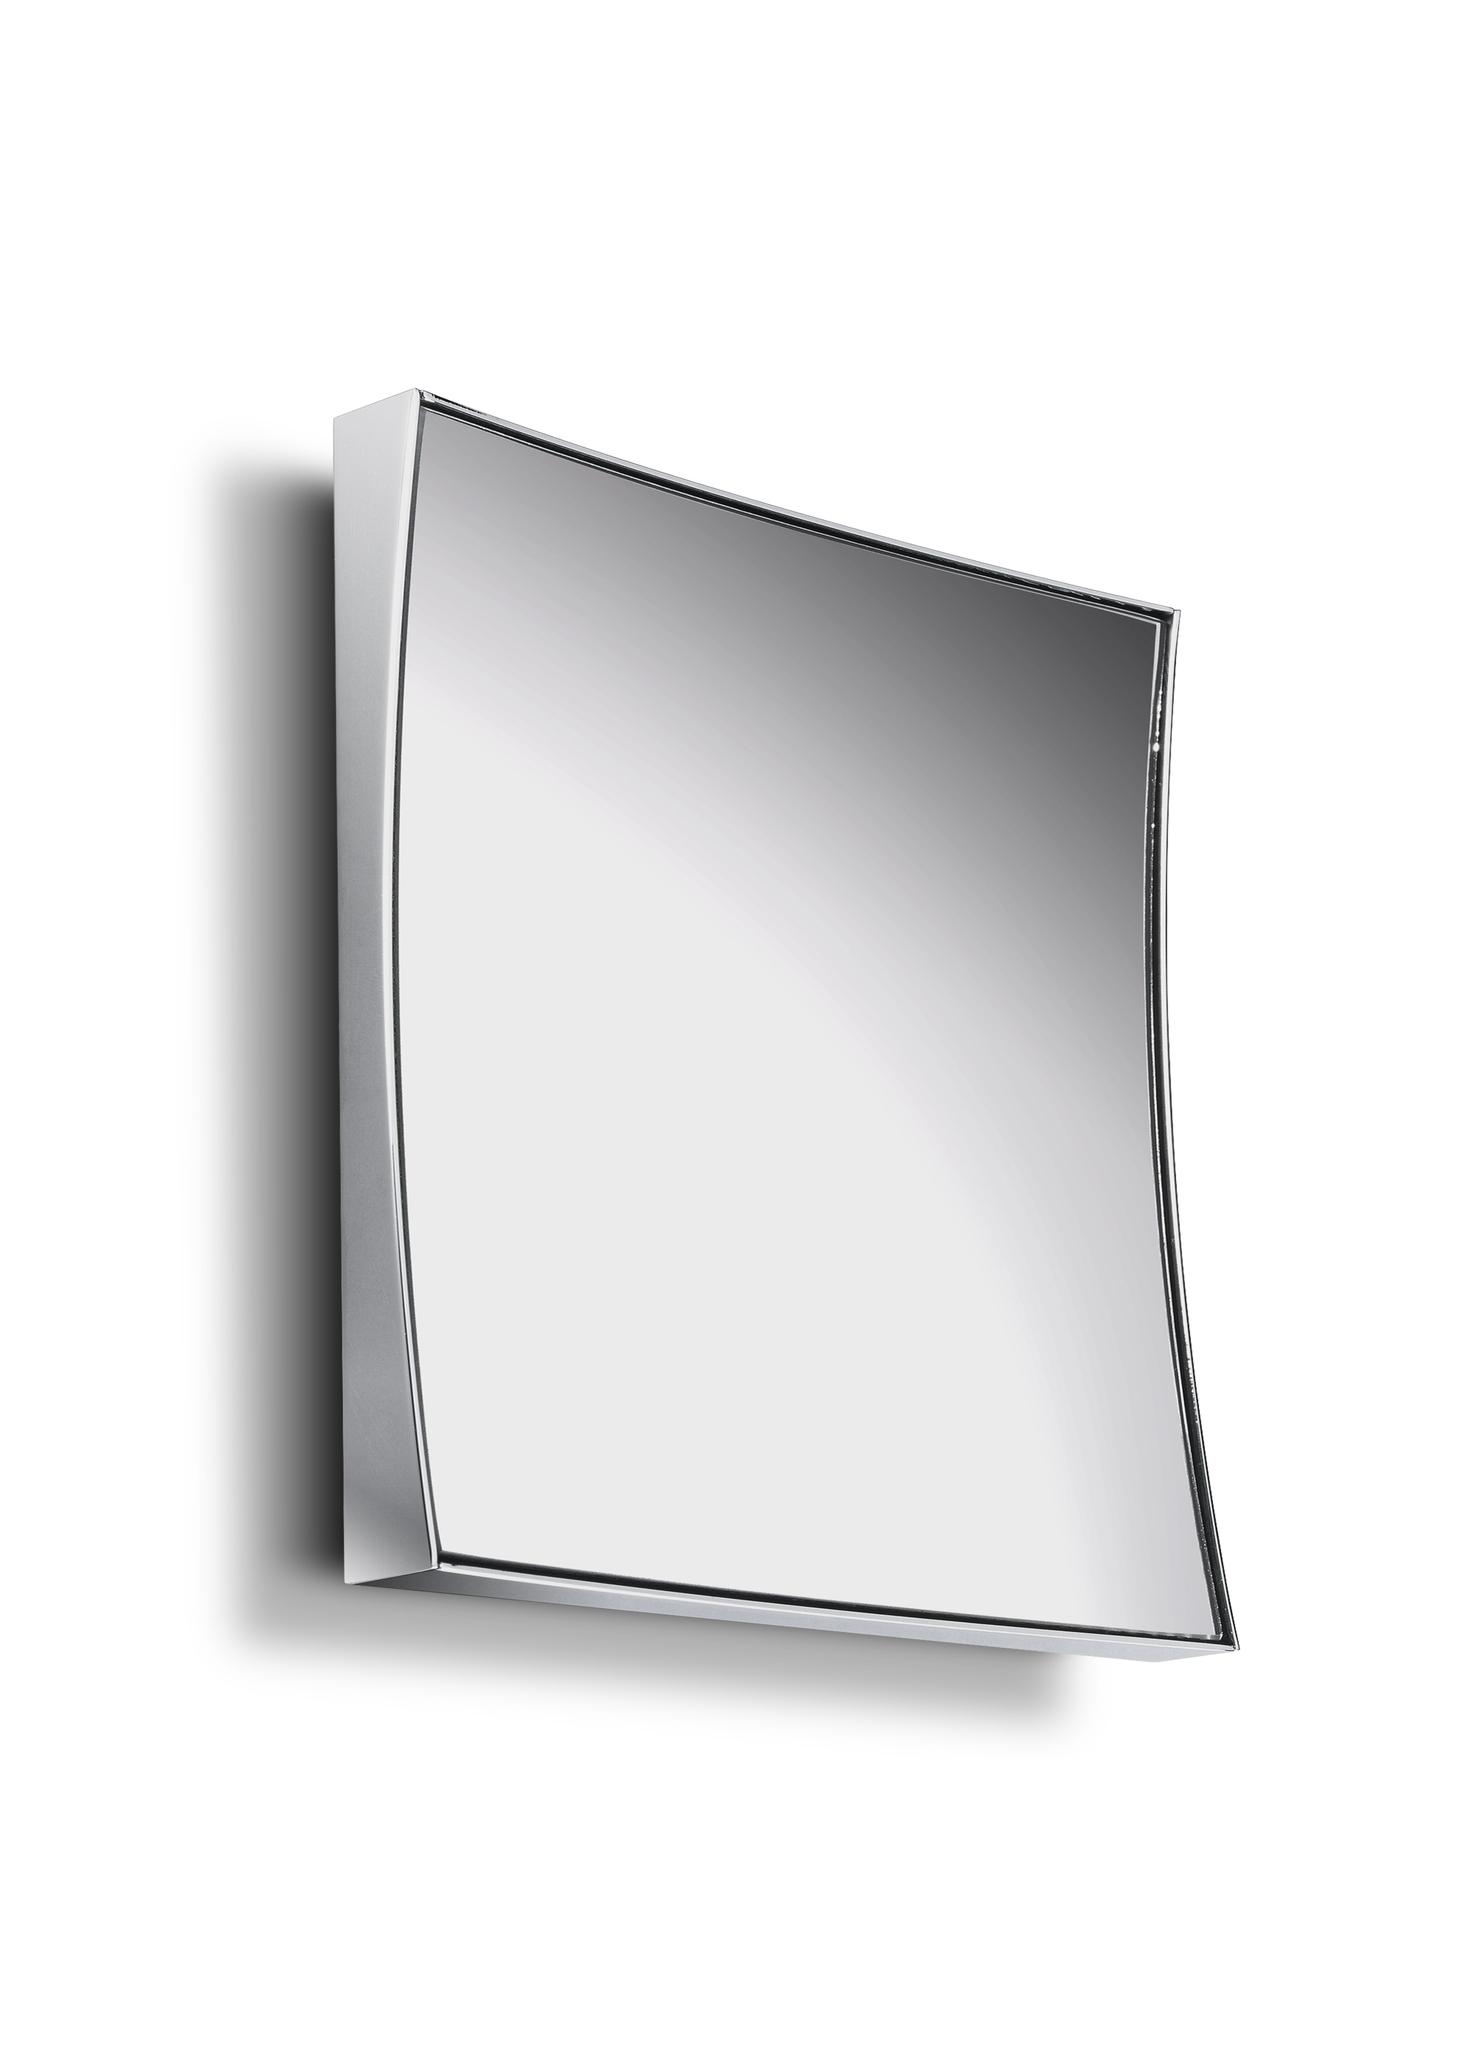 Зеркала Зеркало косметическое на присосках Windisch 99305CR 5X elitnoe-zerkalo-kosmeticheskoe-na-prisoskah-99305-ot-windisch-ispaniya.jpg